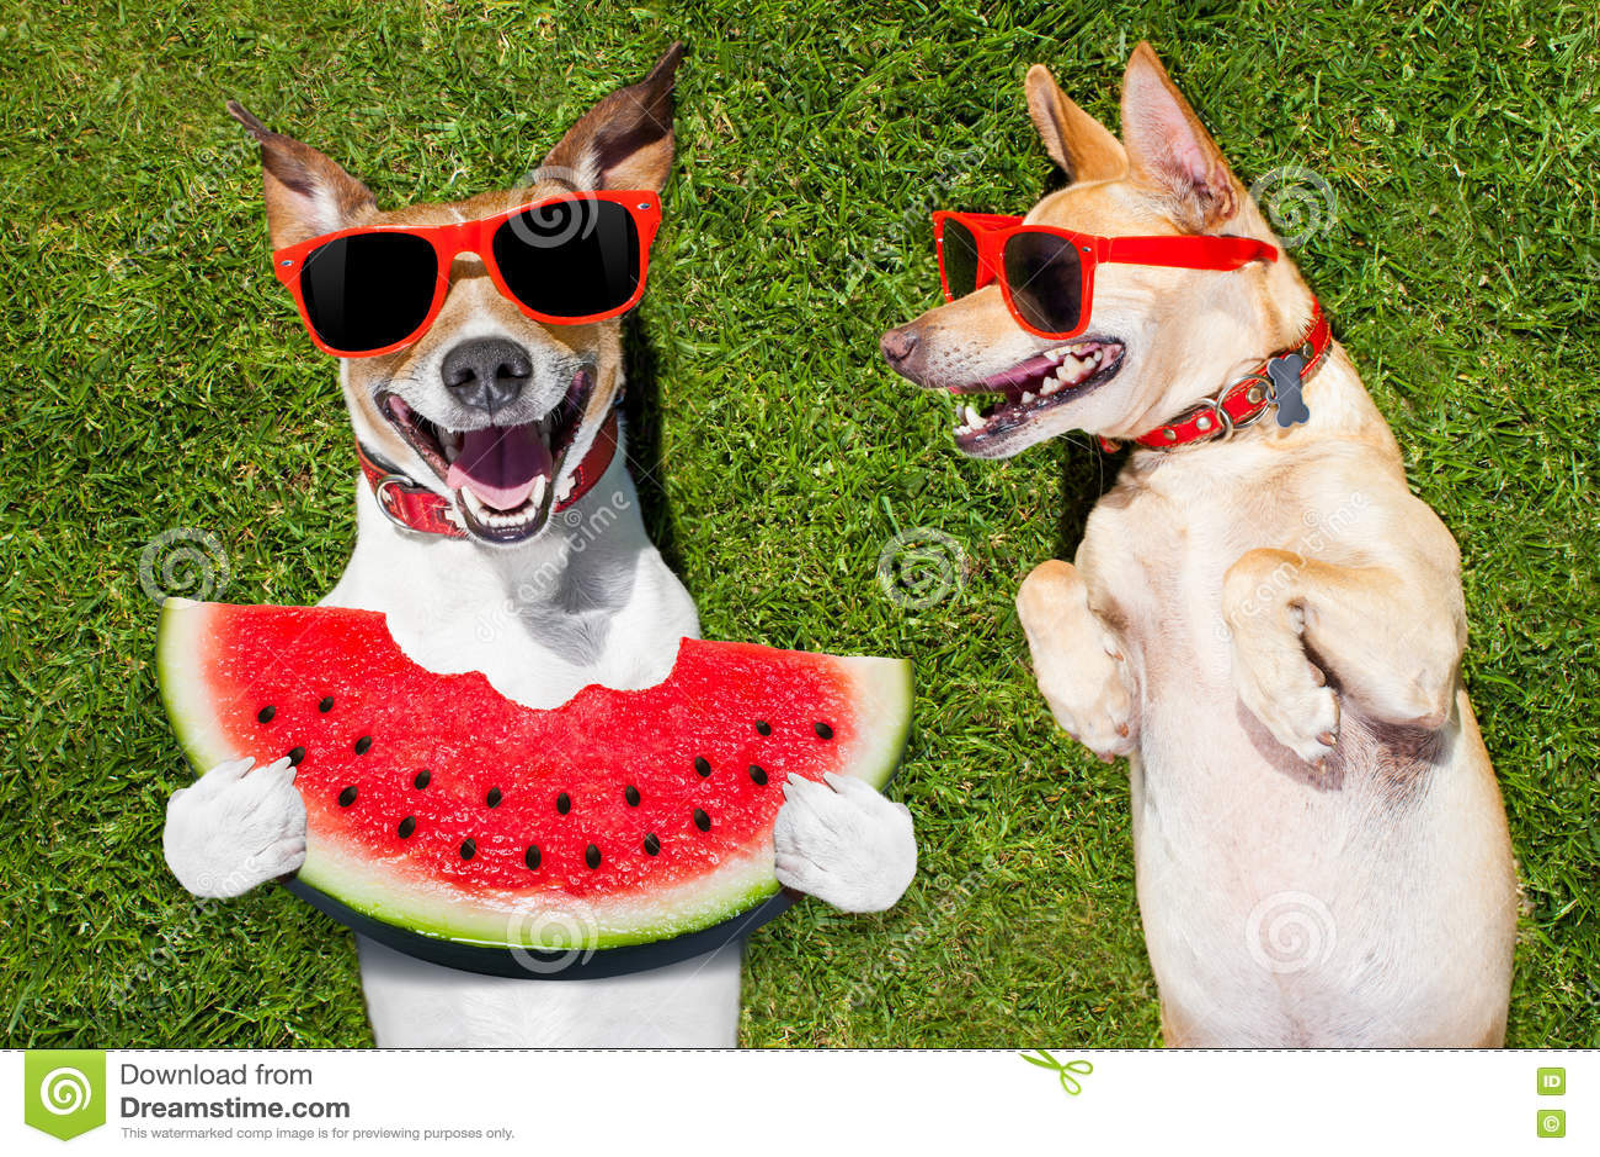 Zwei Lustige Hunde Stockbild Bild Von Lustig Freude 74150969